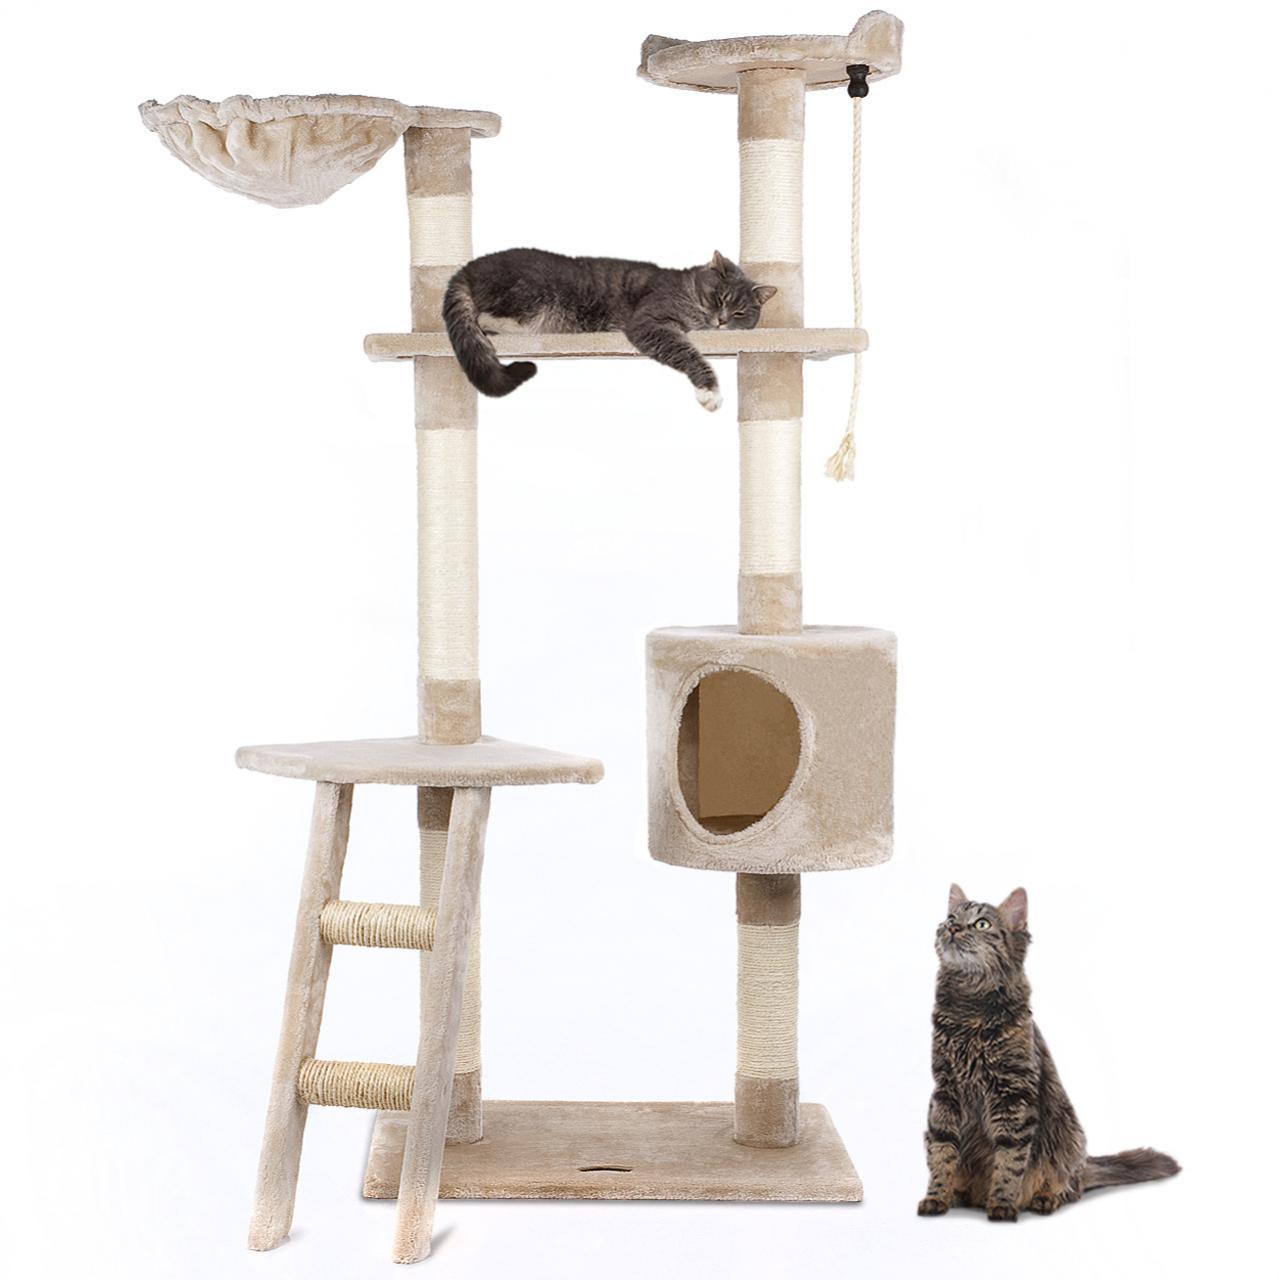 152cm cat tree kitten scratching post furniture sisal climbing excercise centre ebay. Black Bedroom Furniture Sets. Home Design Ideas